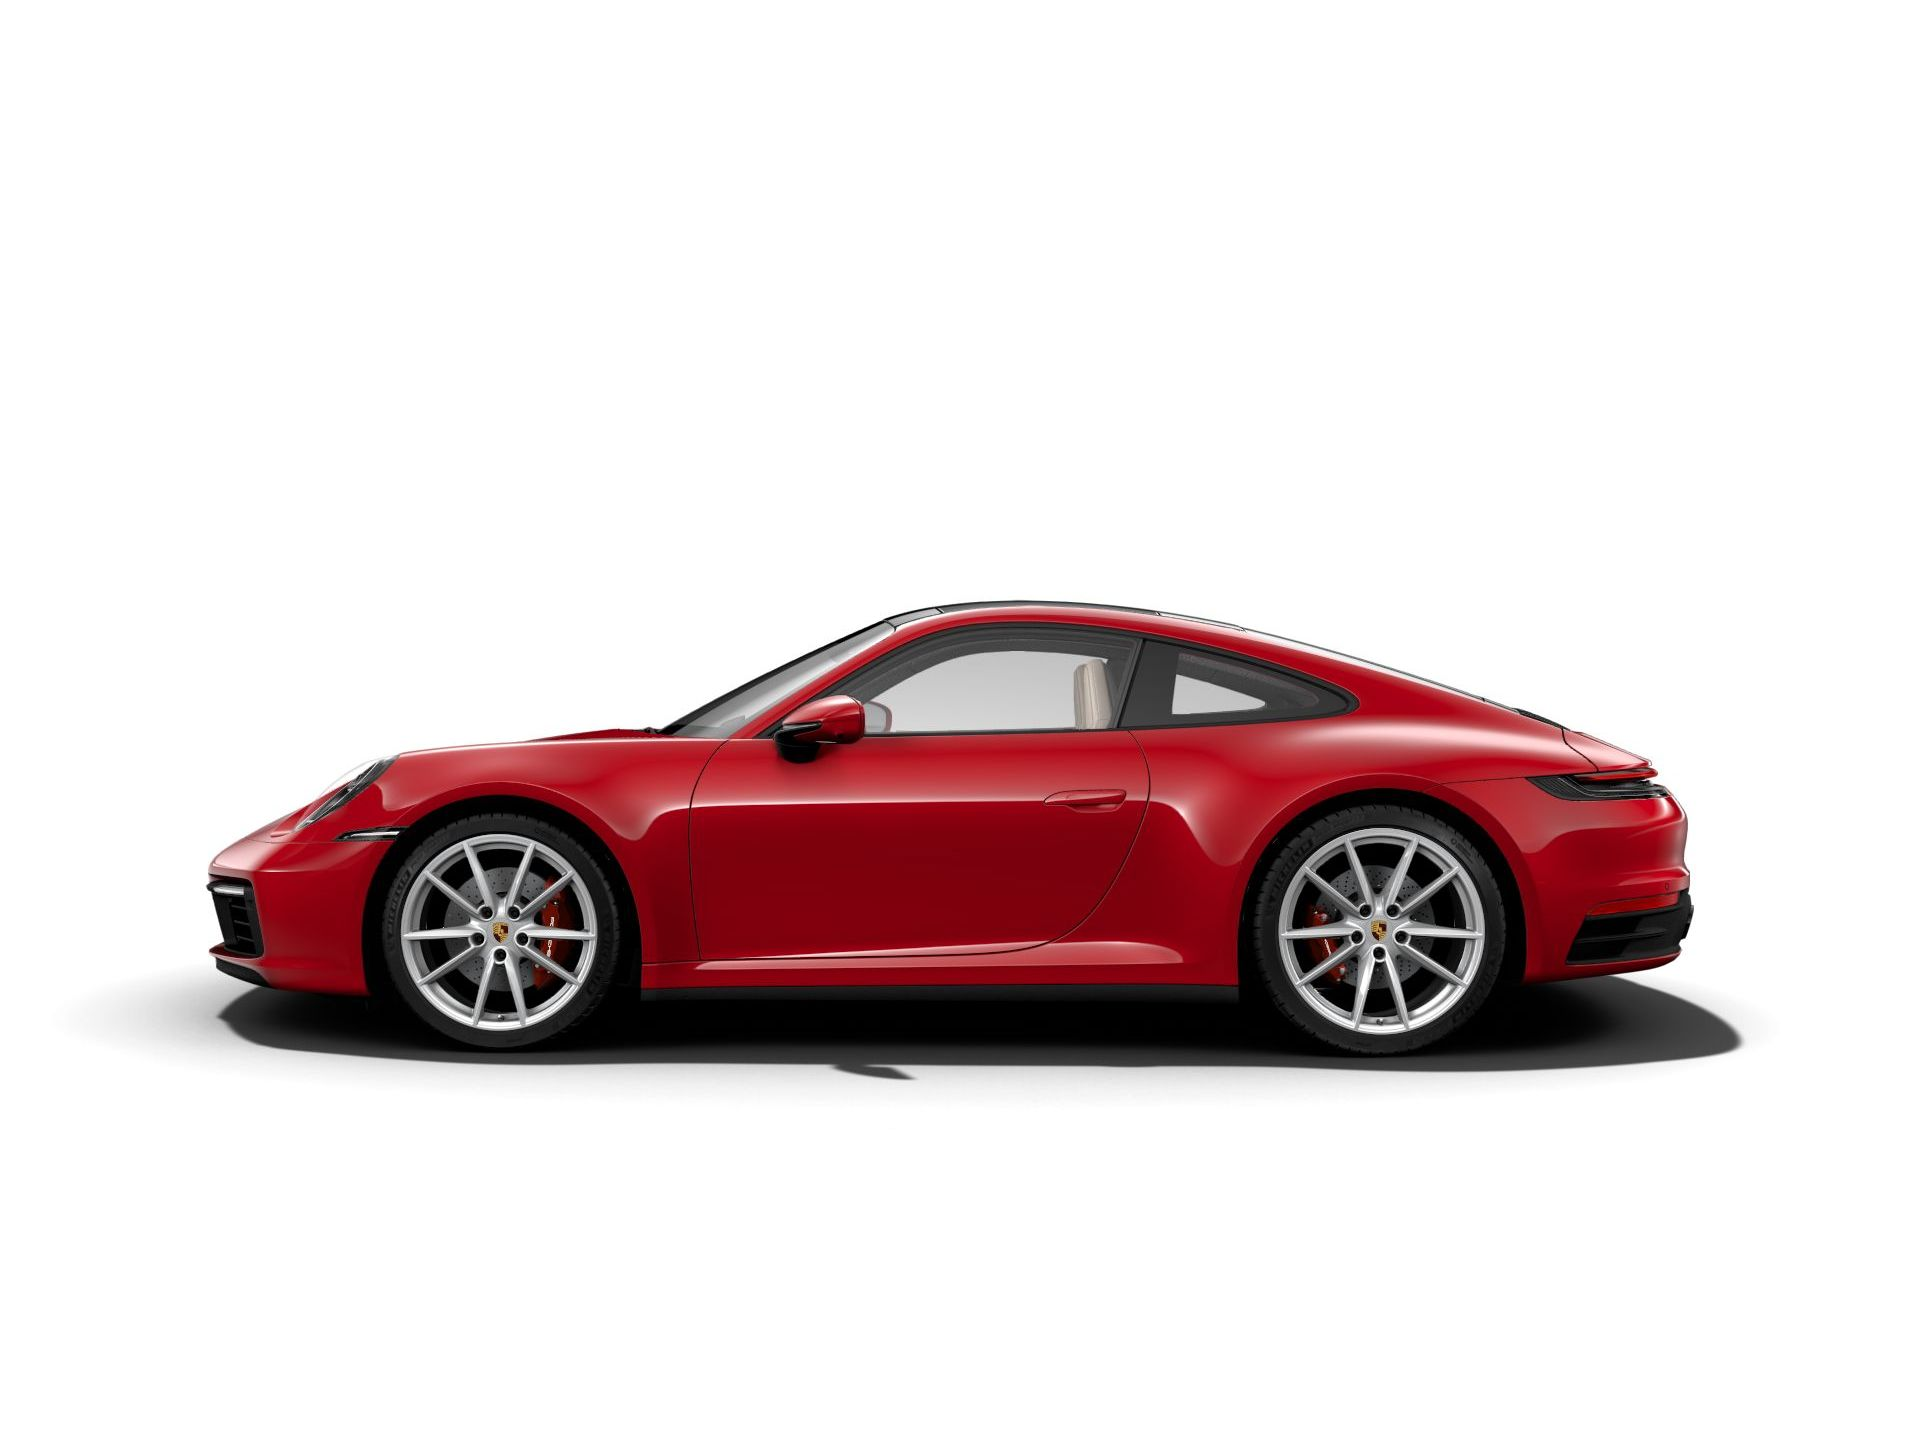 2020 Porsche 911 Carrera 4S (992) – 2